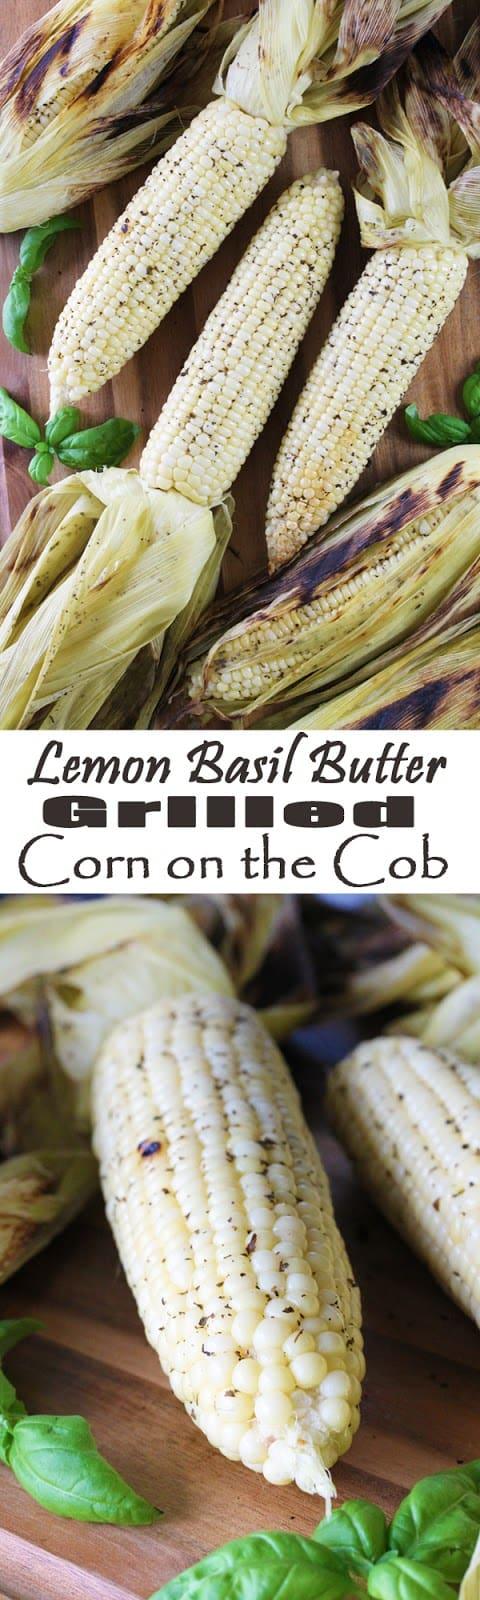 Lemon-Basil Butter Grilled Corn on the Cob